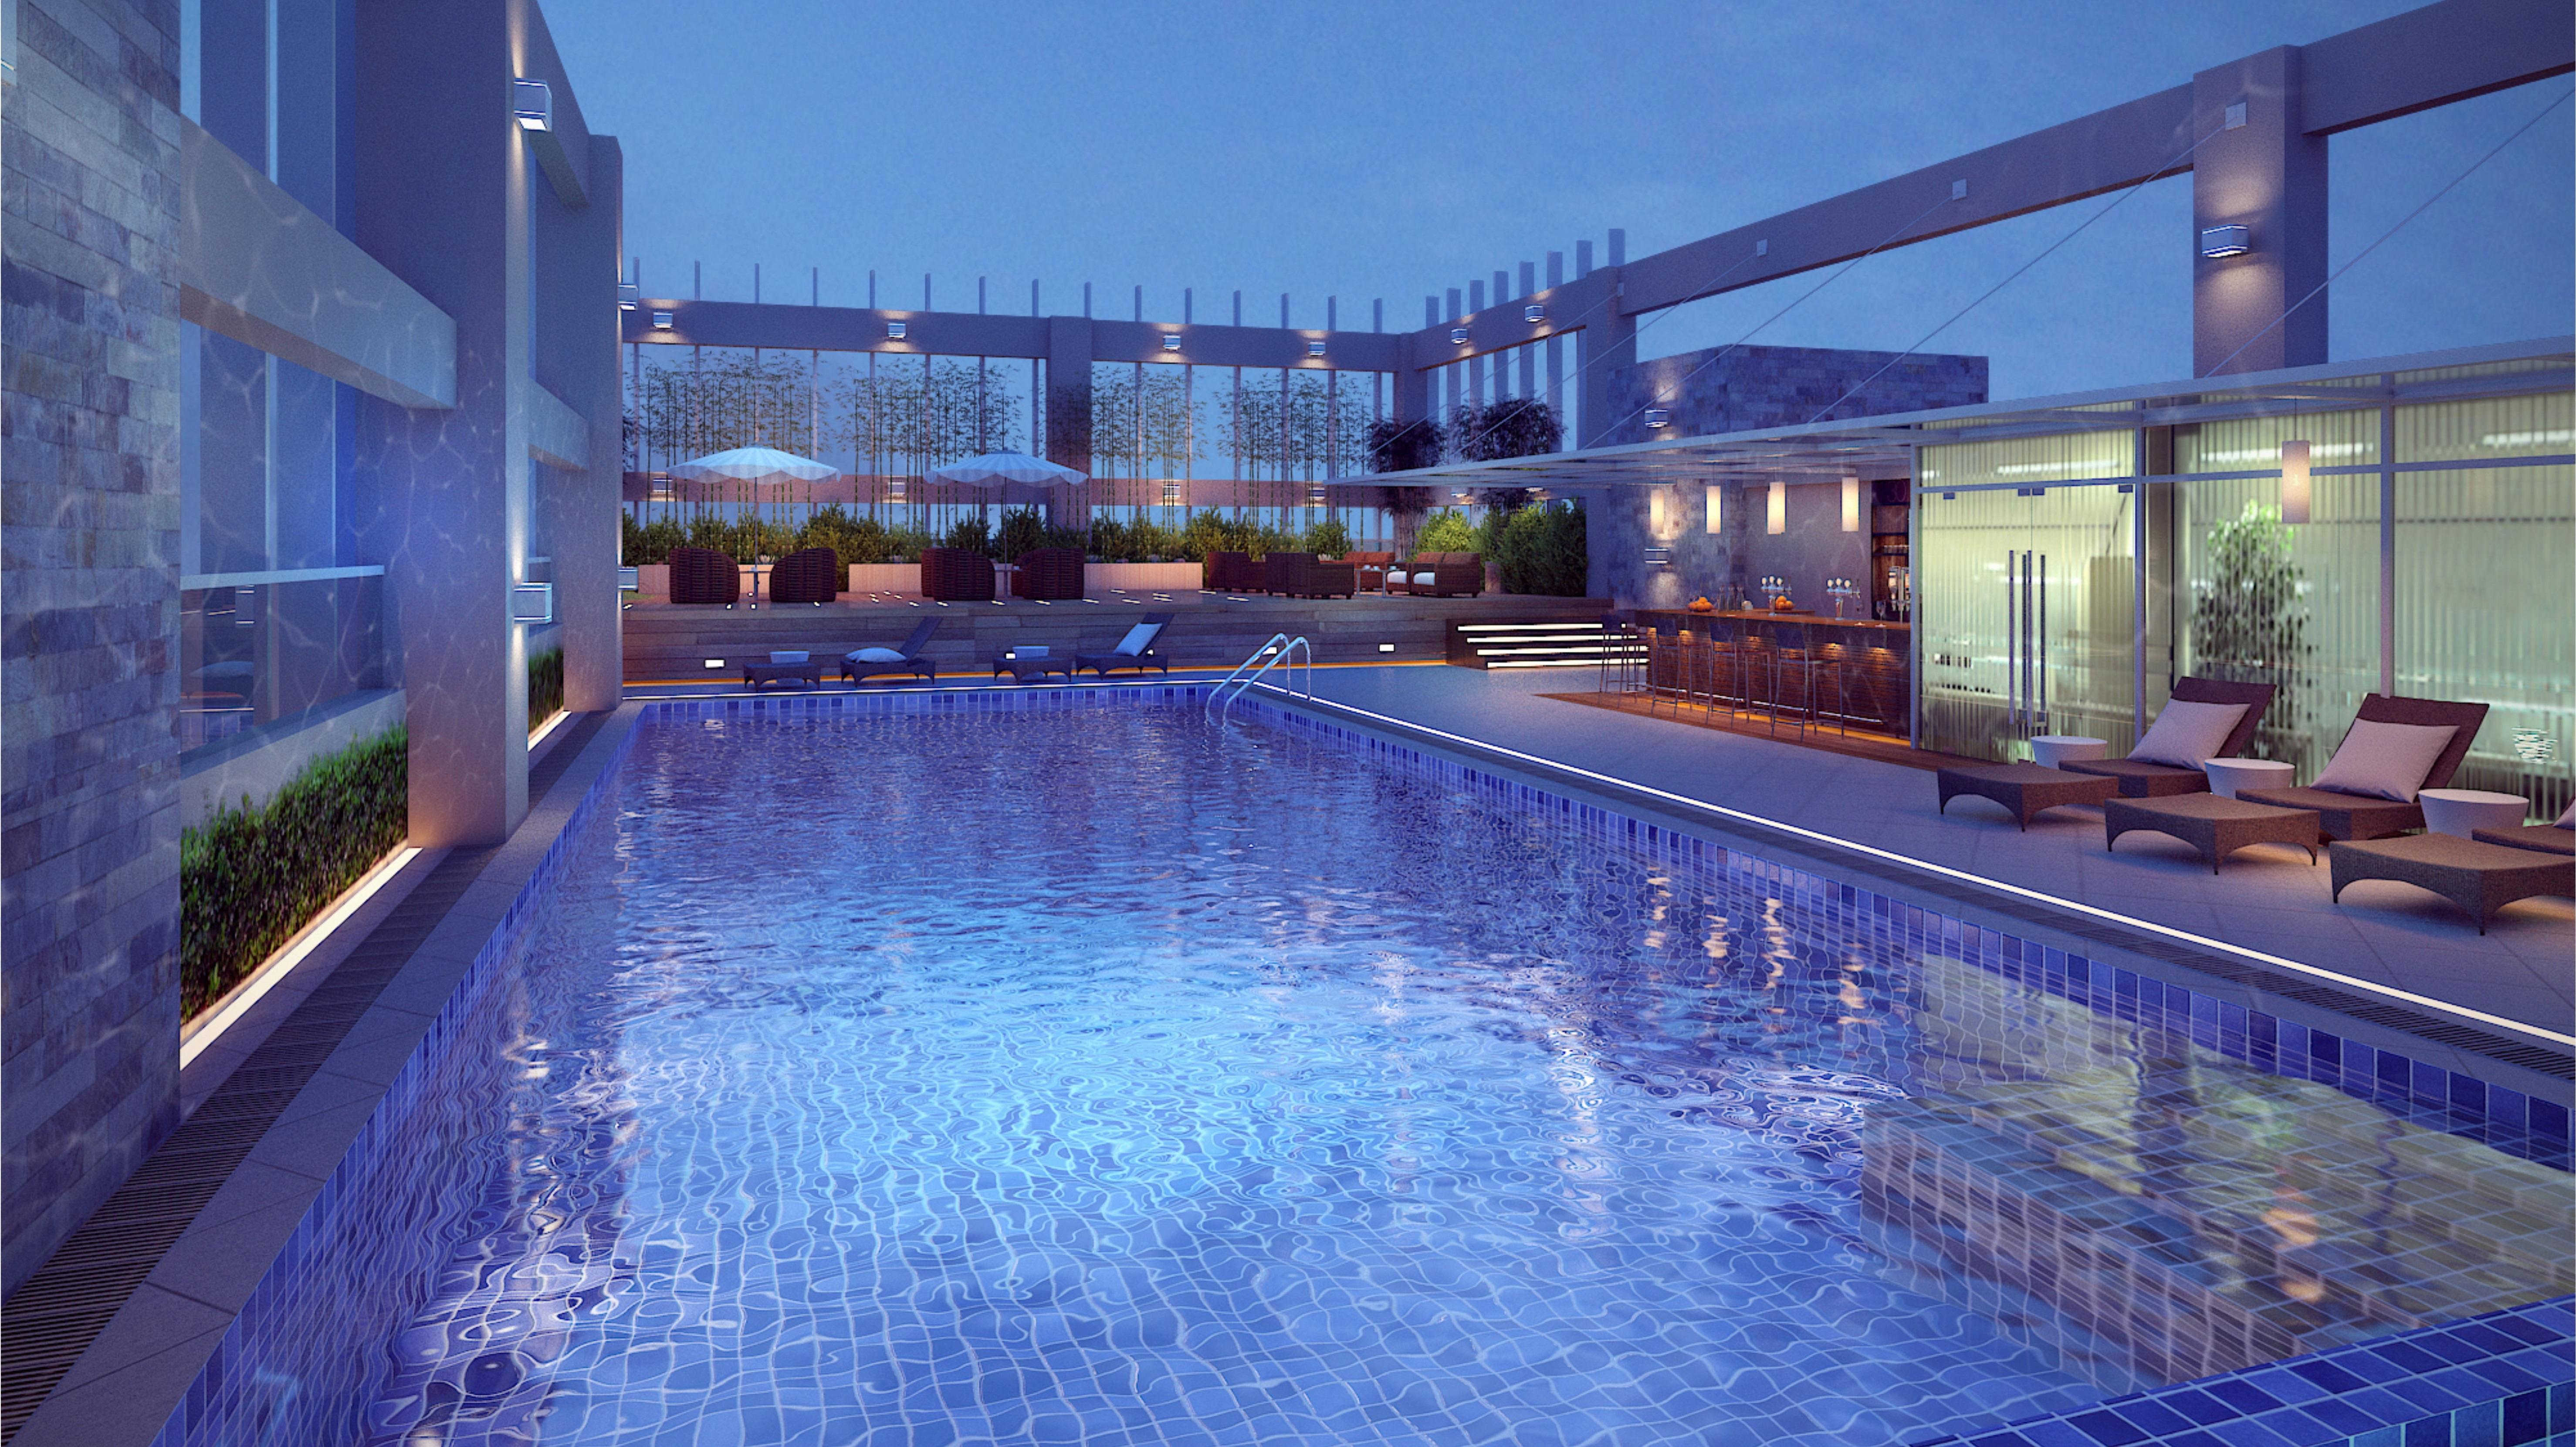 mövenpick hotels set to open new property in sylhet, bangladesh